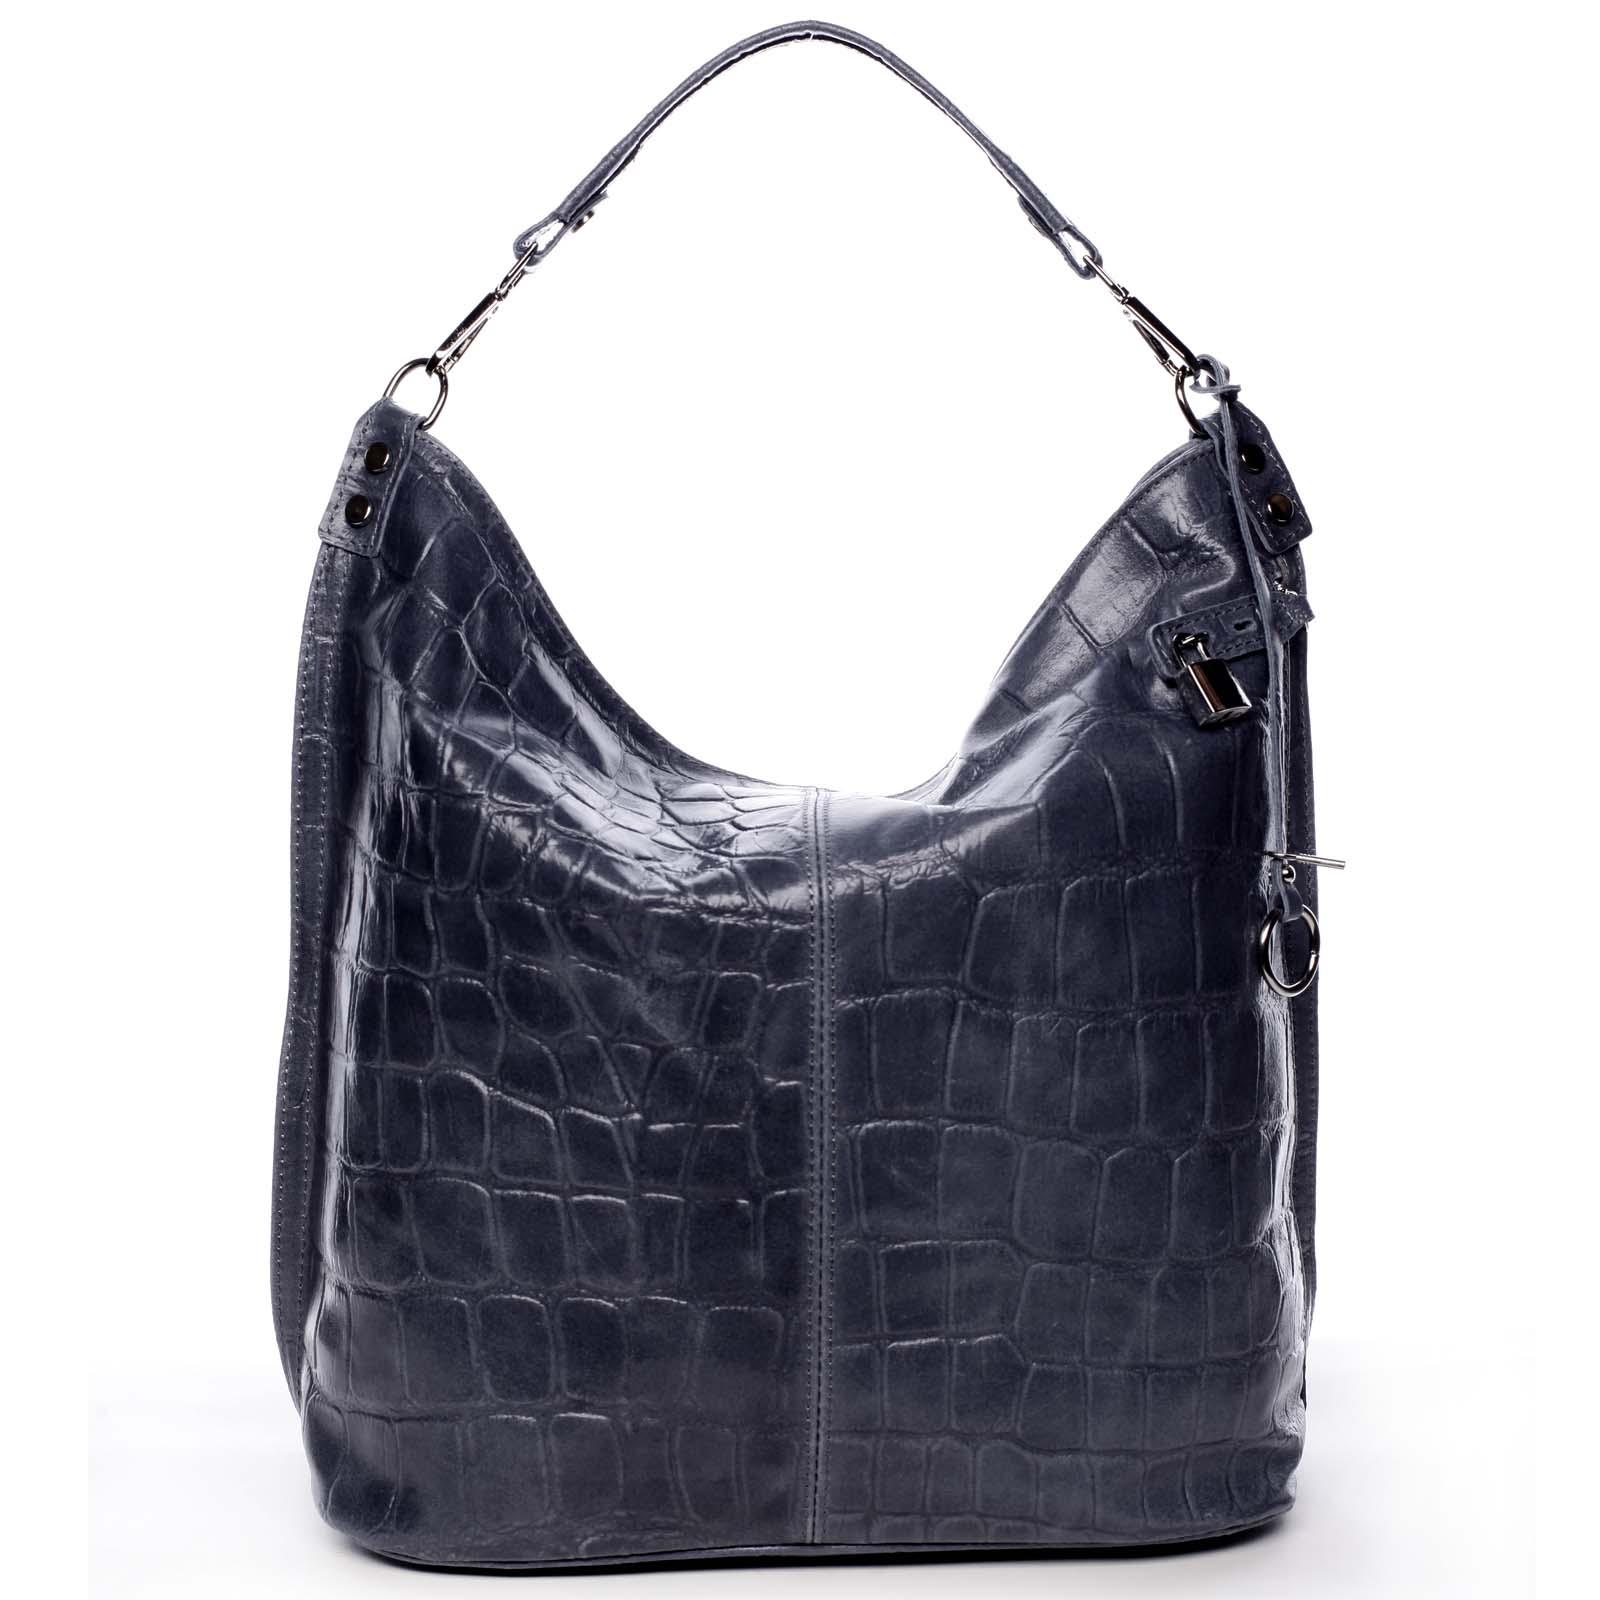 Veľká kožená dámska kabelka modrá - ItalY Celinda modrá